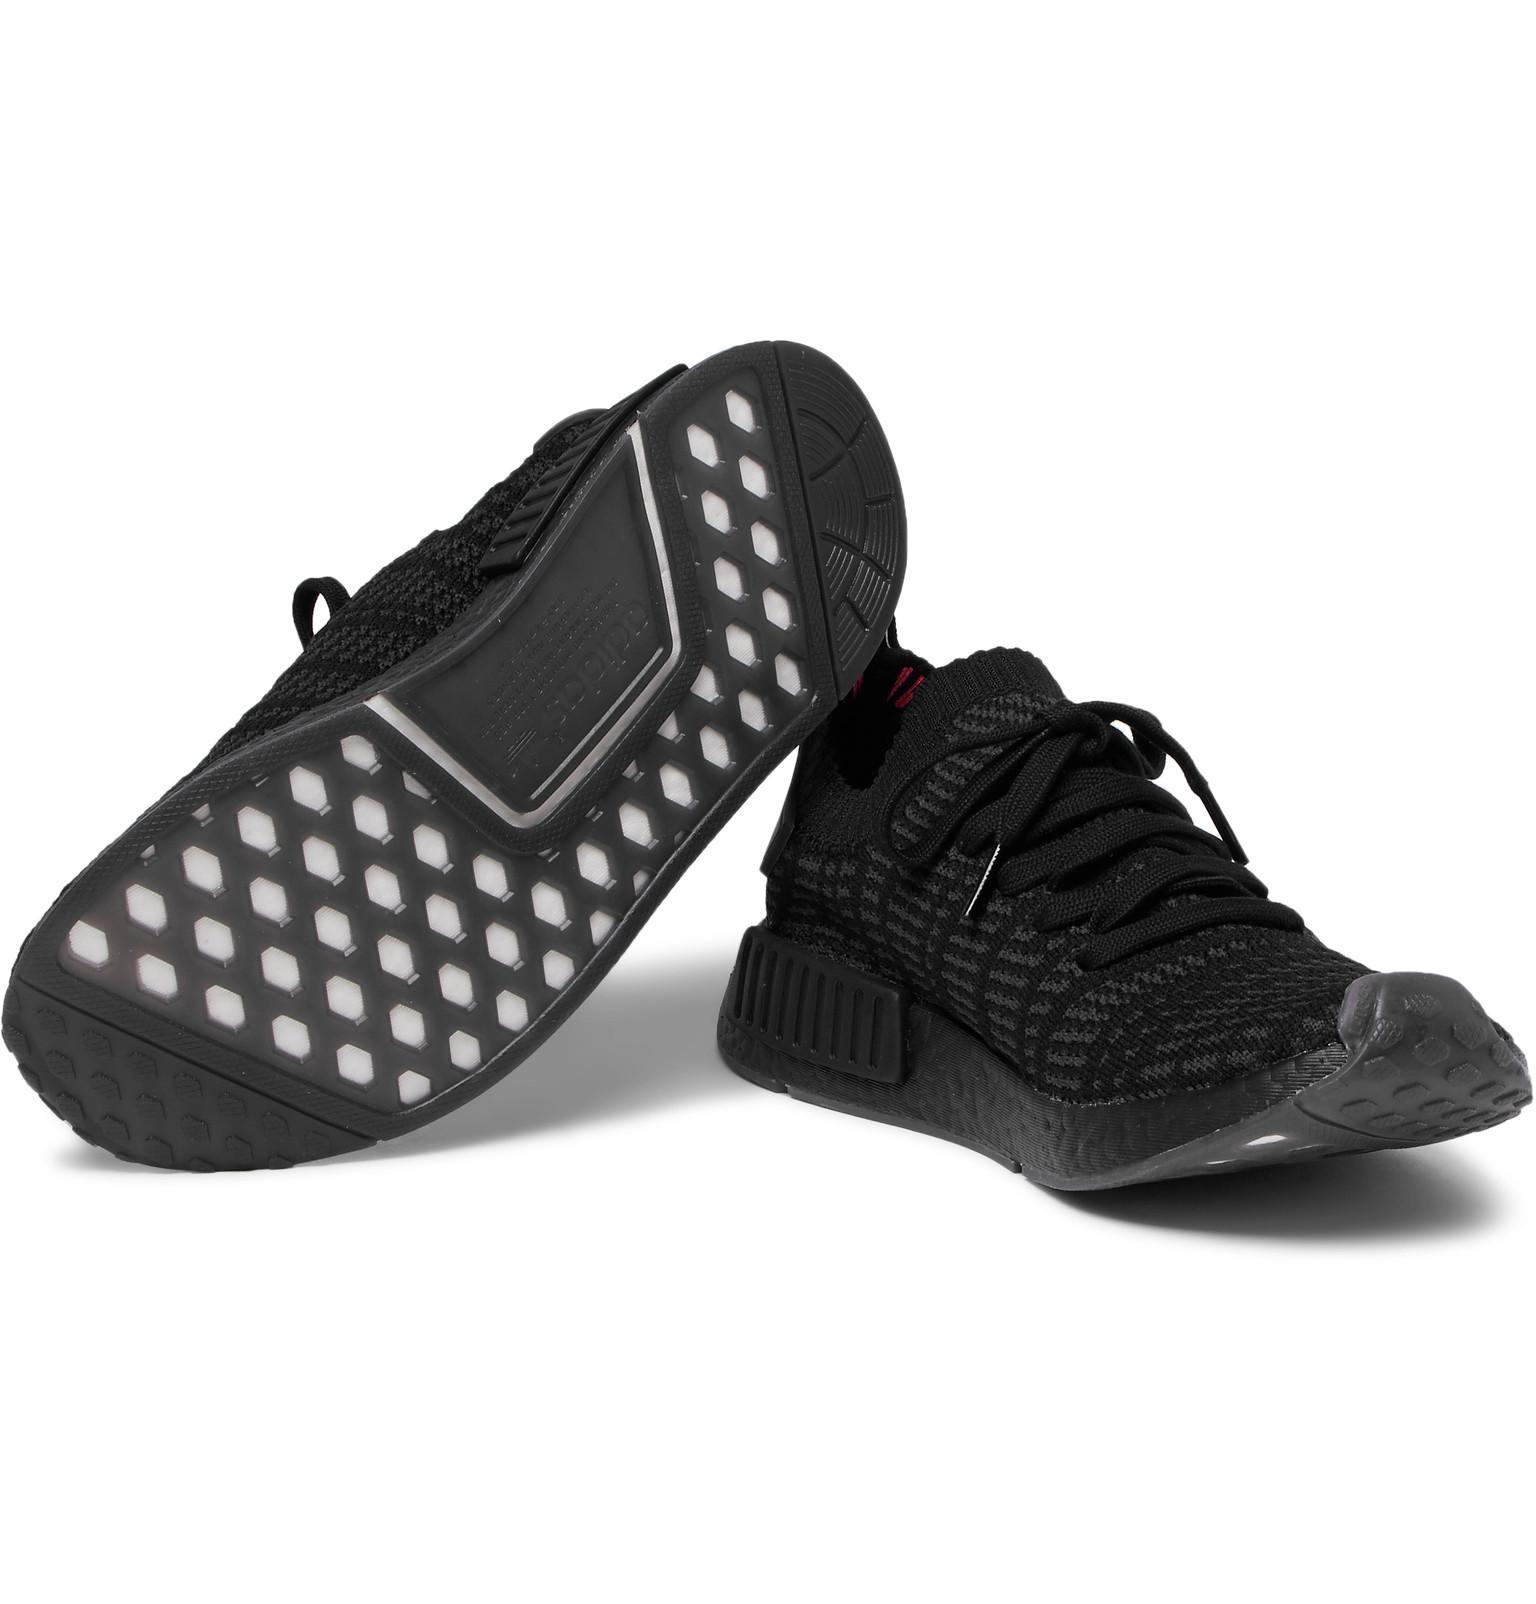 adidas Originals Nmd r1 Stlt Primeknit Sneakers in Black for Men - Lyst b58f1fe59